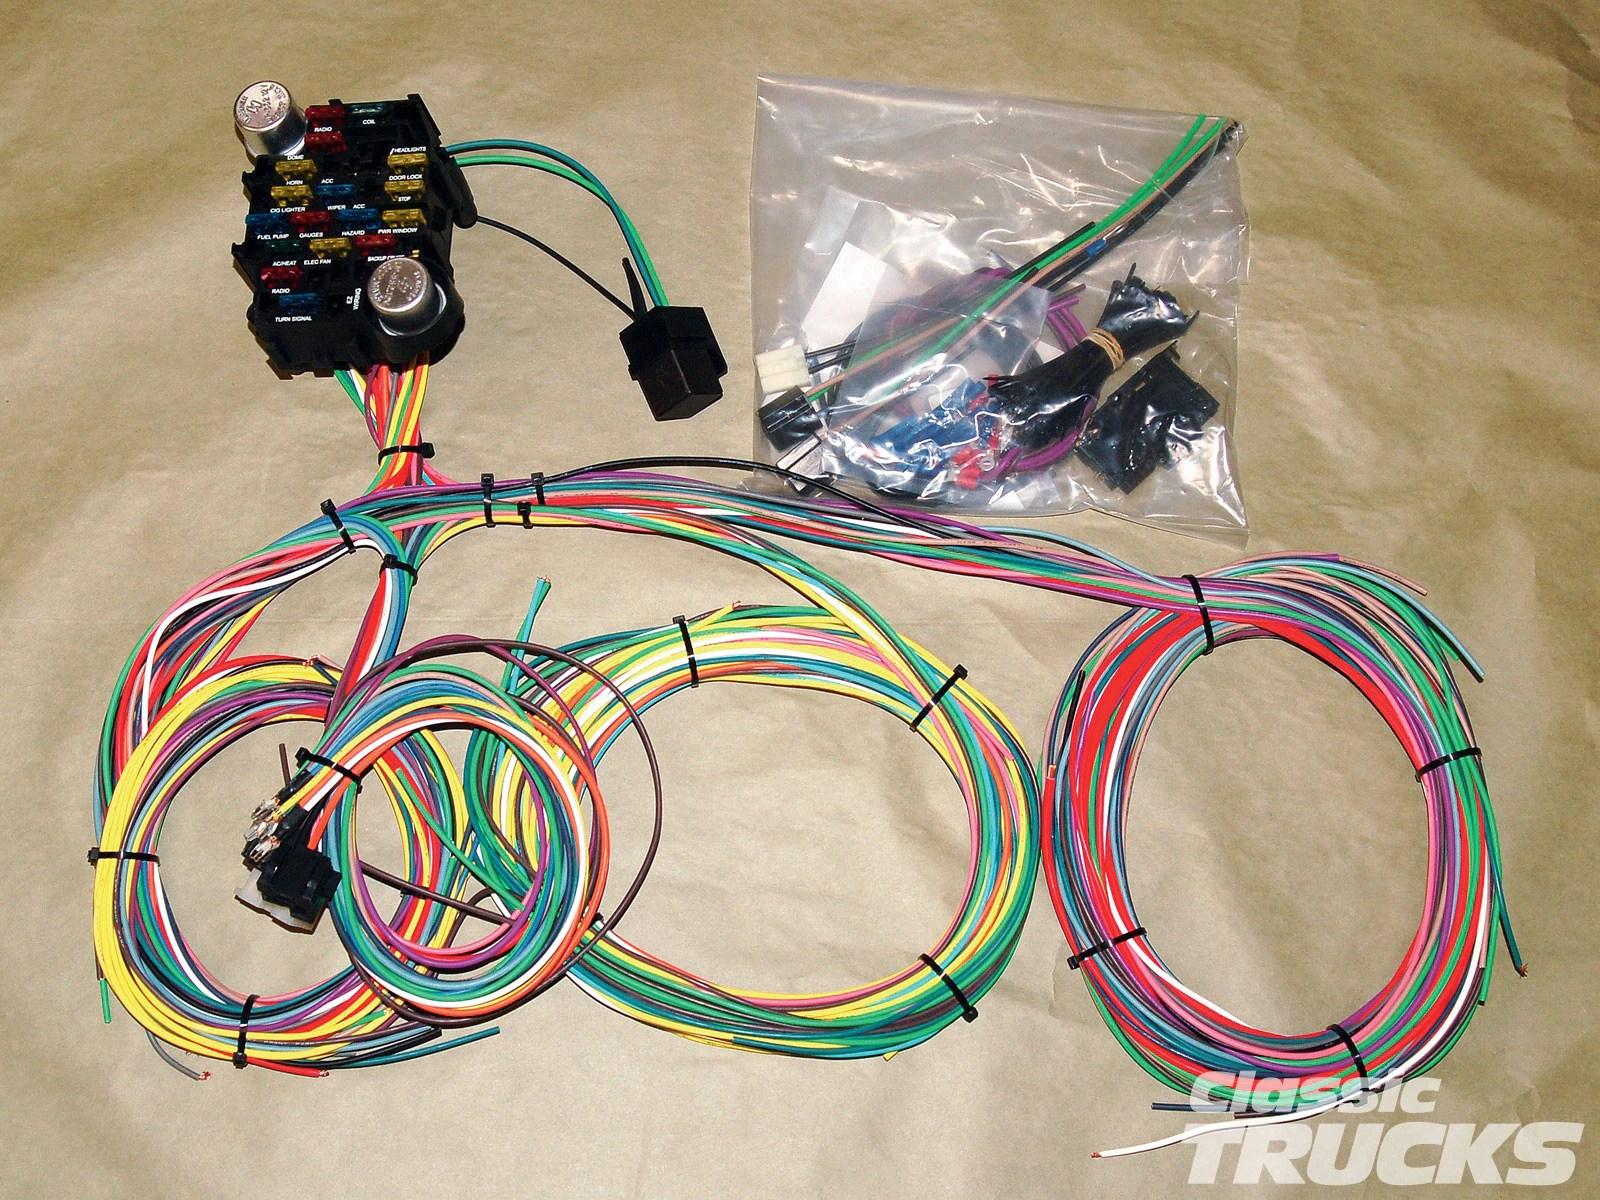 jd 2520 wiring diagram wiring diagram john deere 2520 wiring harness [ 1600 x 1200 Pixel ]